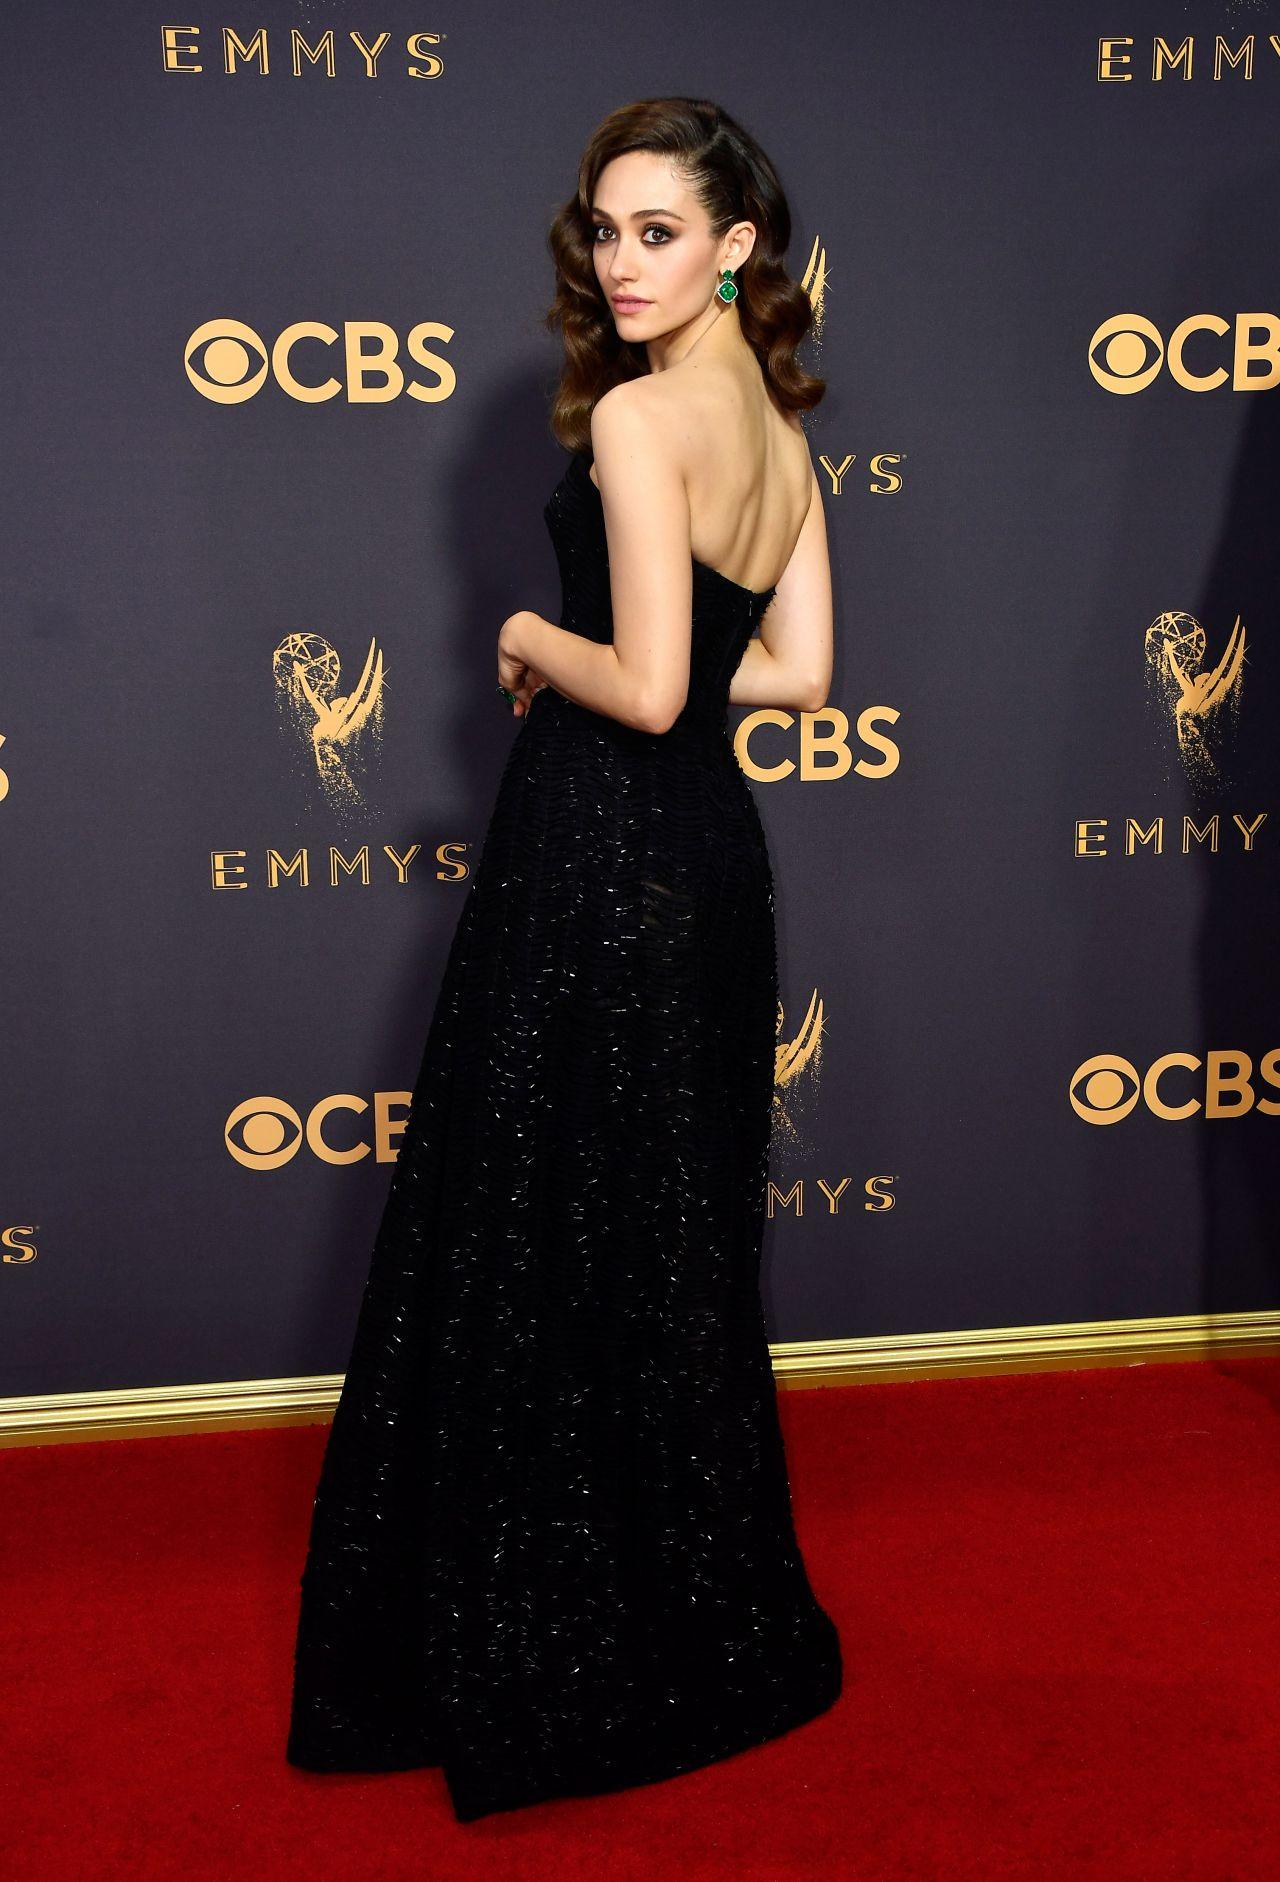 Emmy Rossum Emmy Awards In Los Angeles 09 17 2017